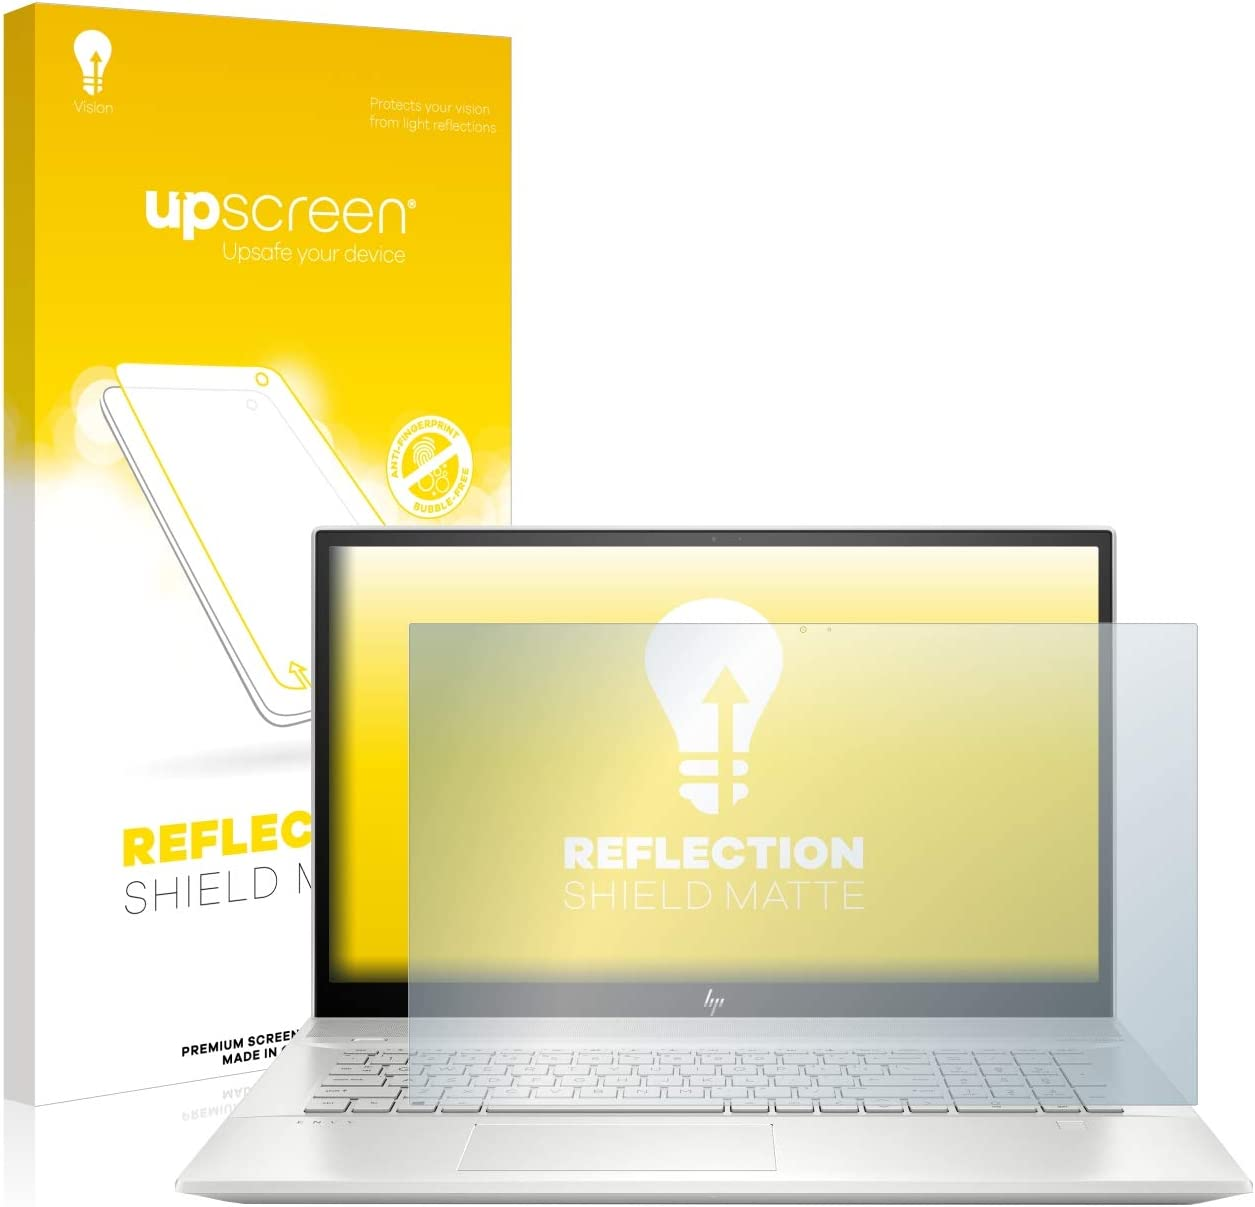 Anti-Reflex Displayschutz-Folie Matt upscreen Entspiegelungs-Schutzfolie kompatibel mit HP Envy 17-ce1611ng